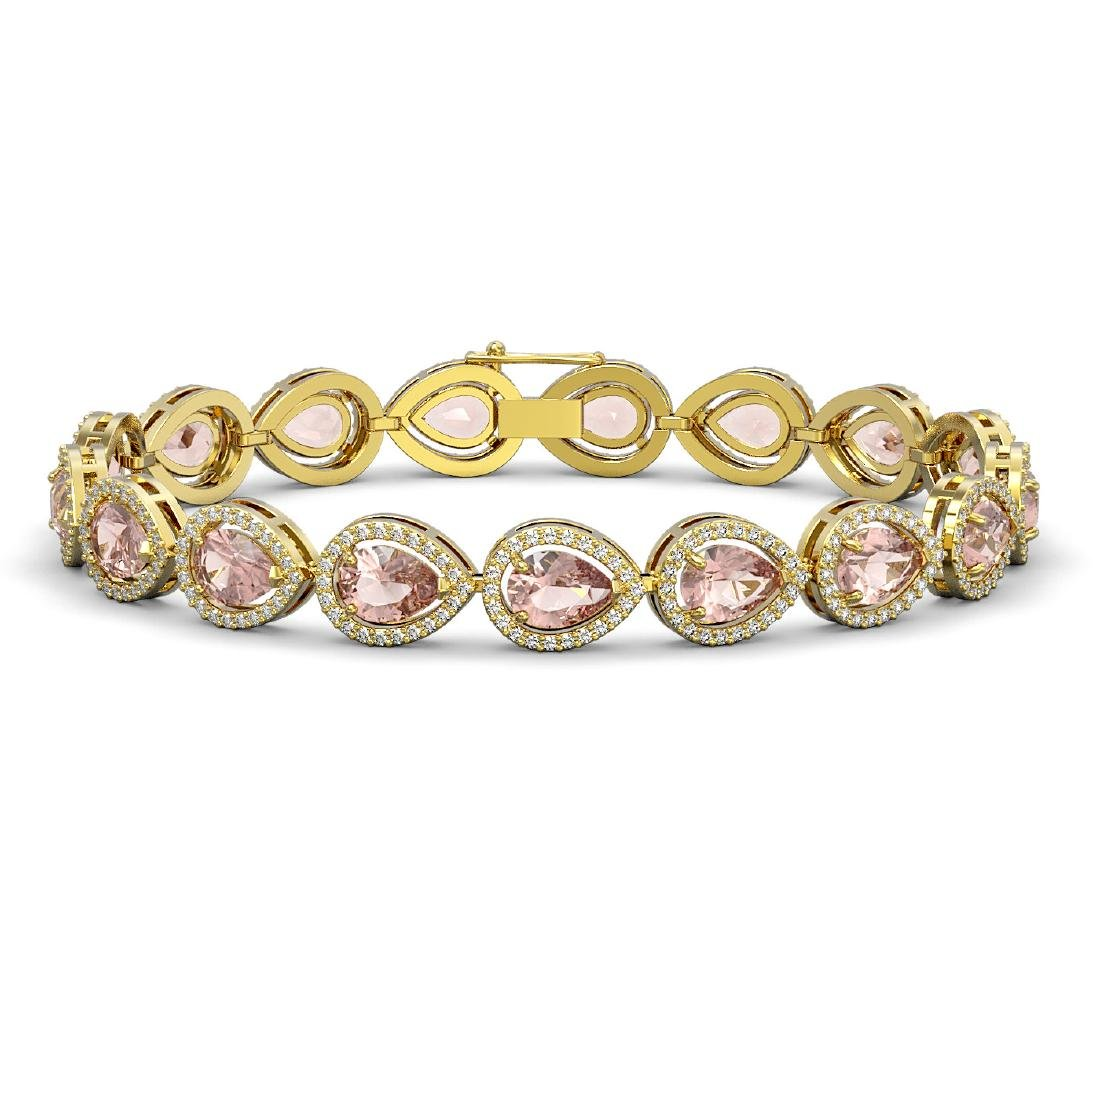 16.59 CTW Morganite & Diamond Halo Bracelet 10K Yellow